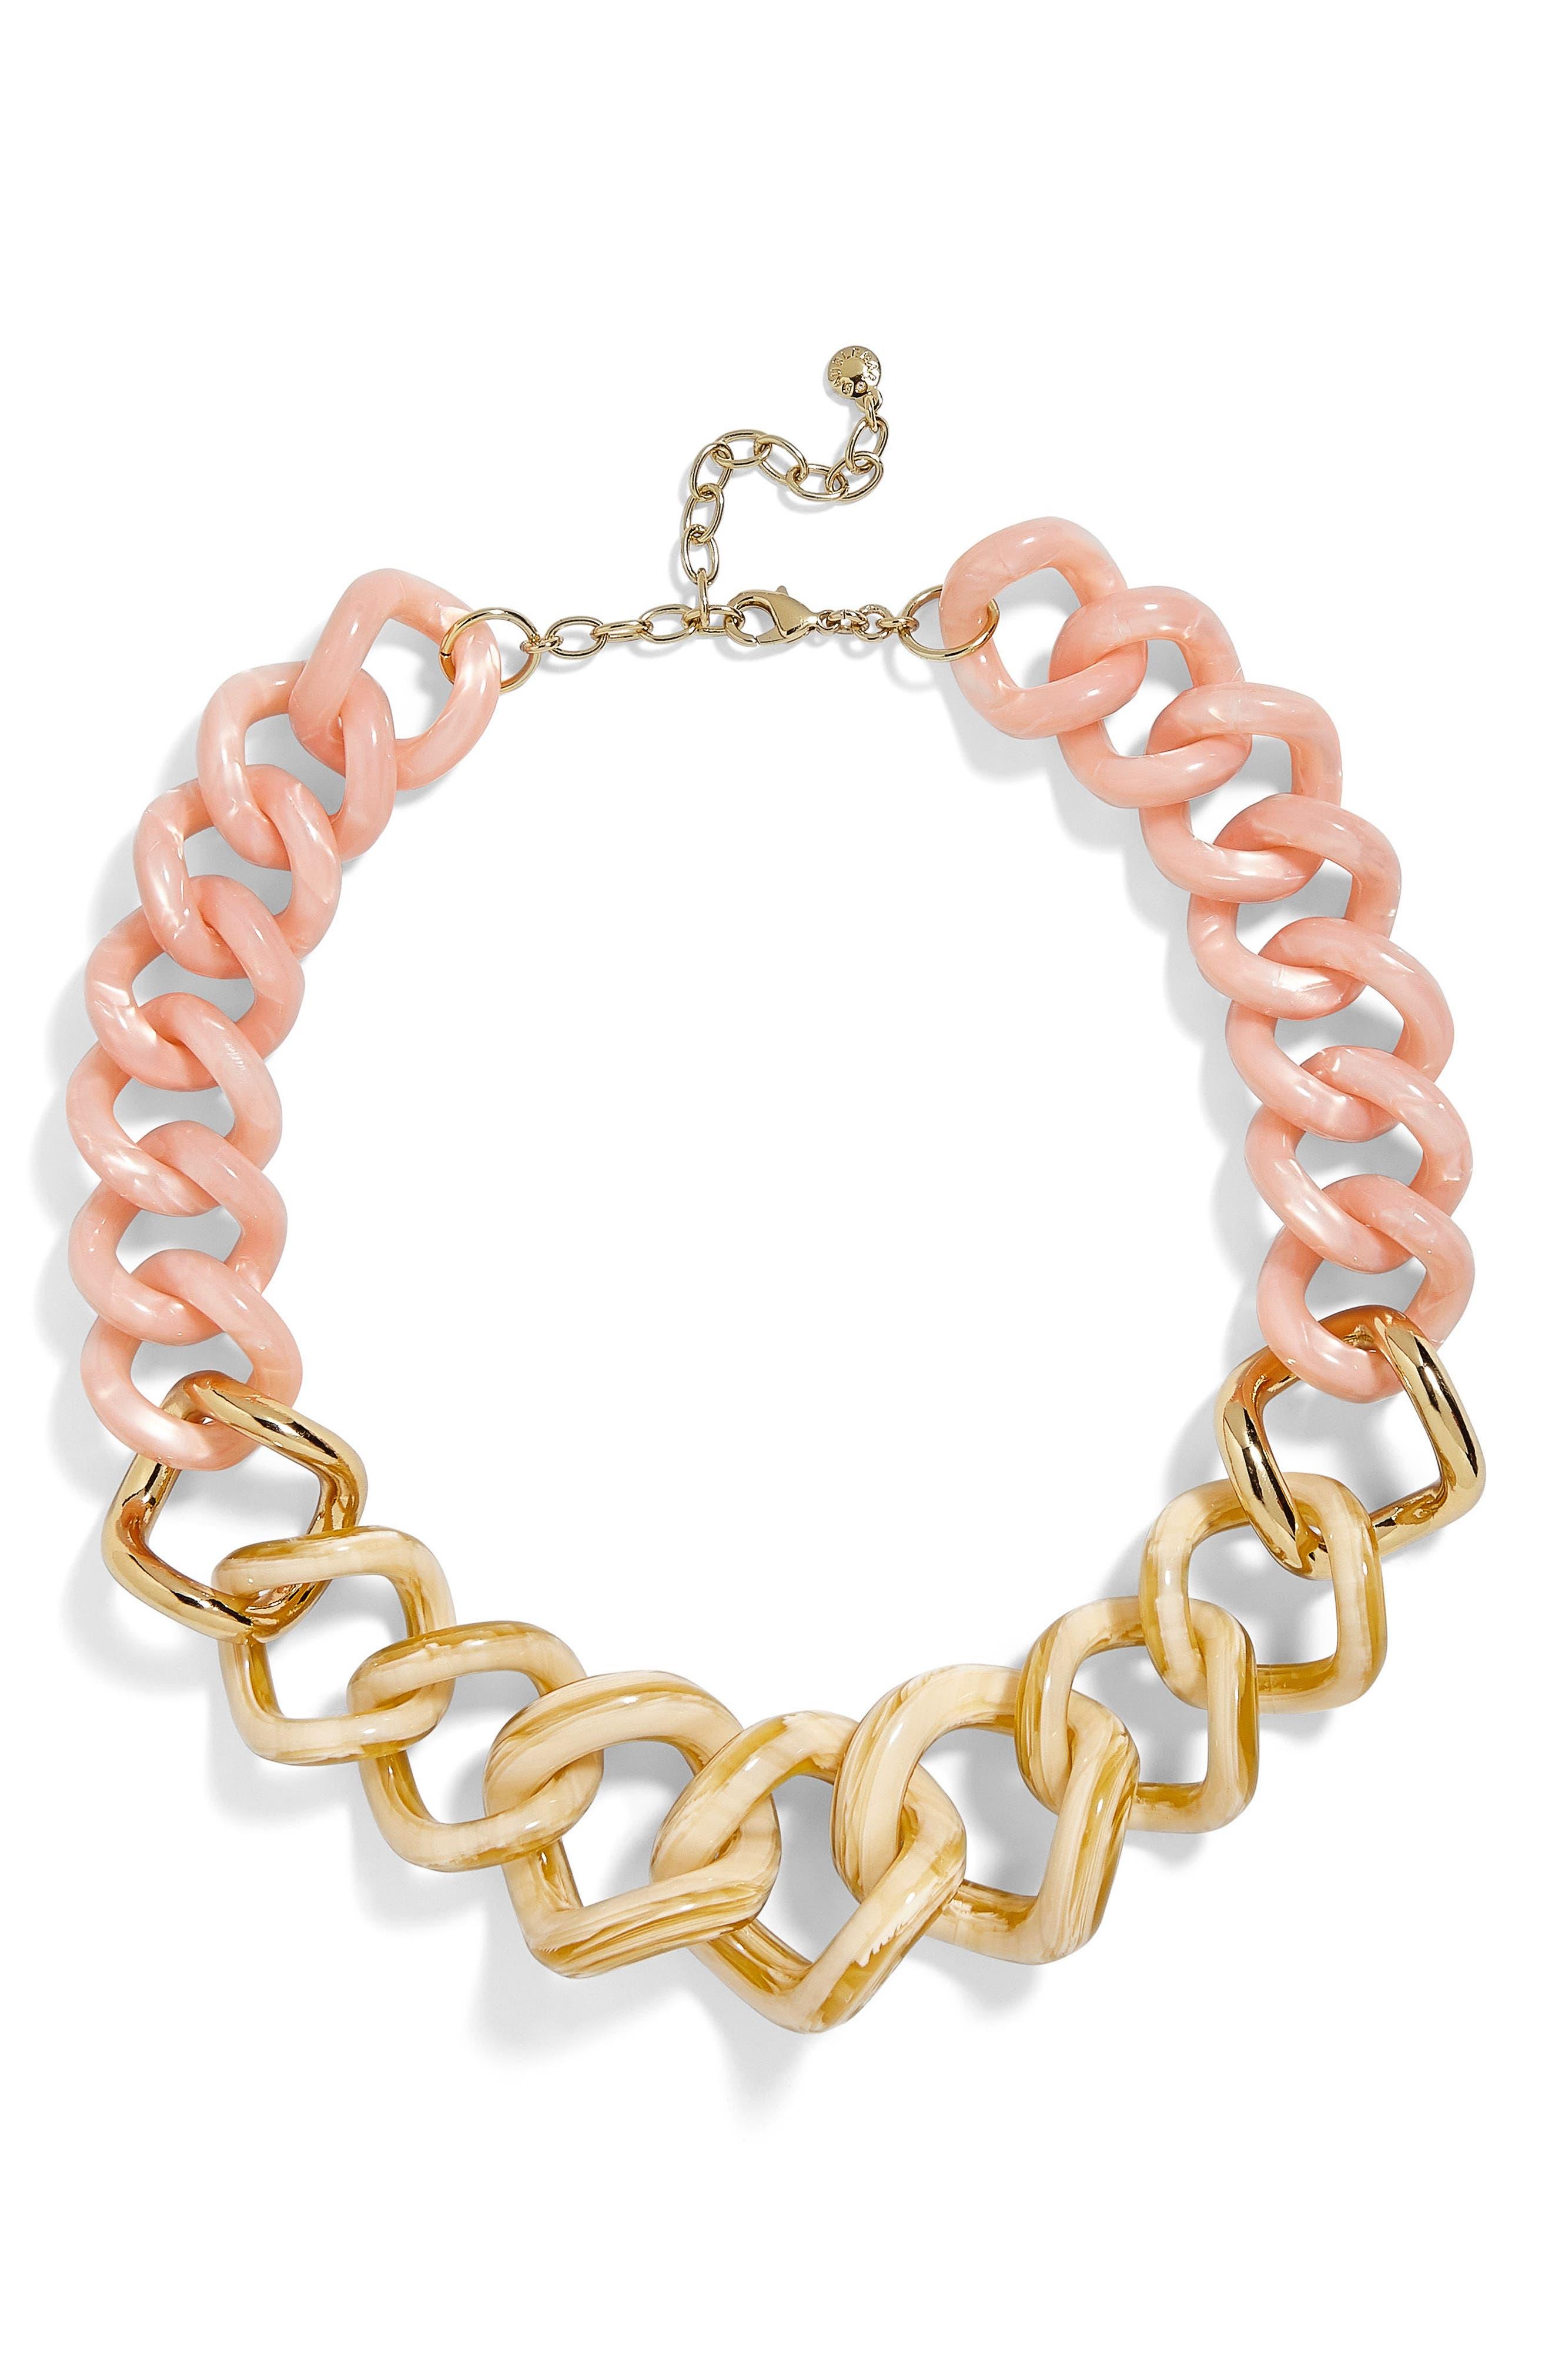 Francina Large Acrylic Link Necklace,                             Main thumbnail 1, color,                             689